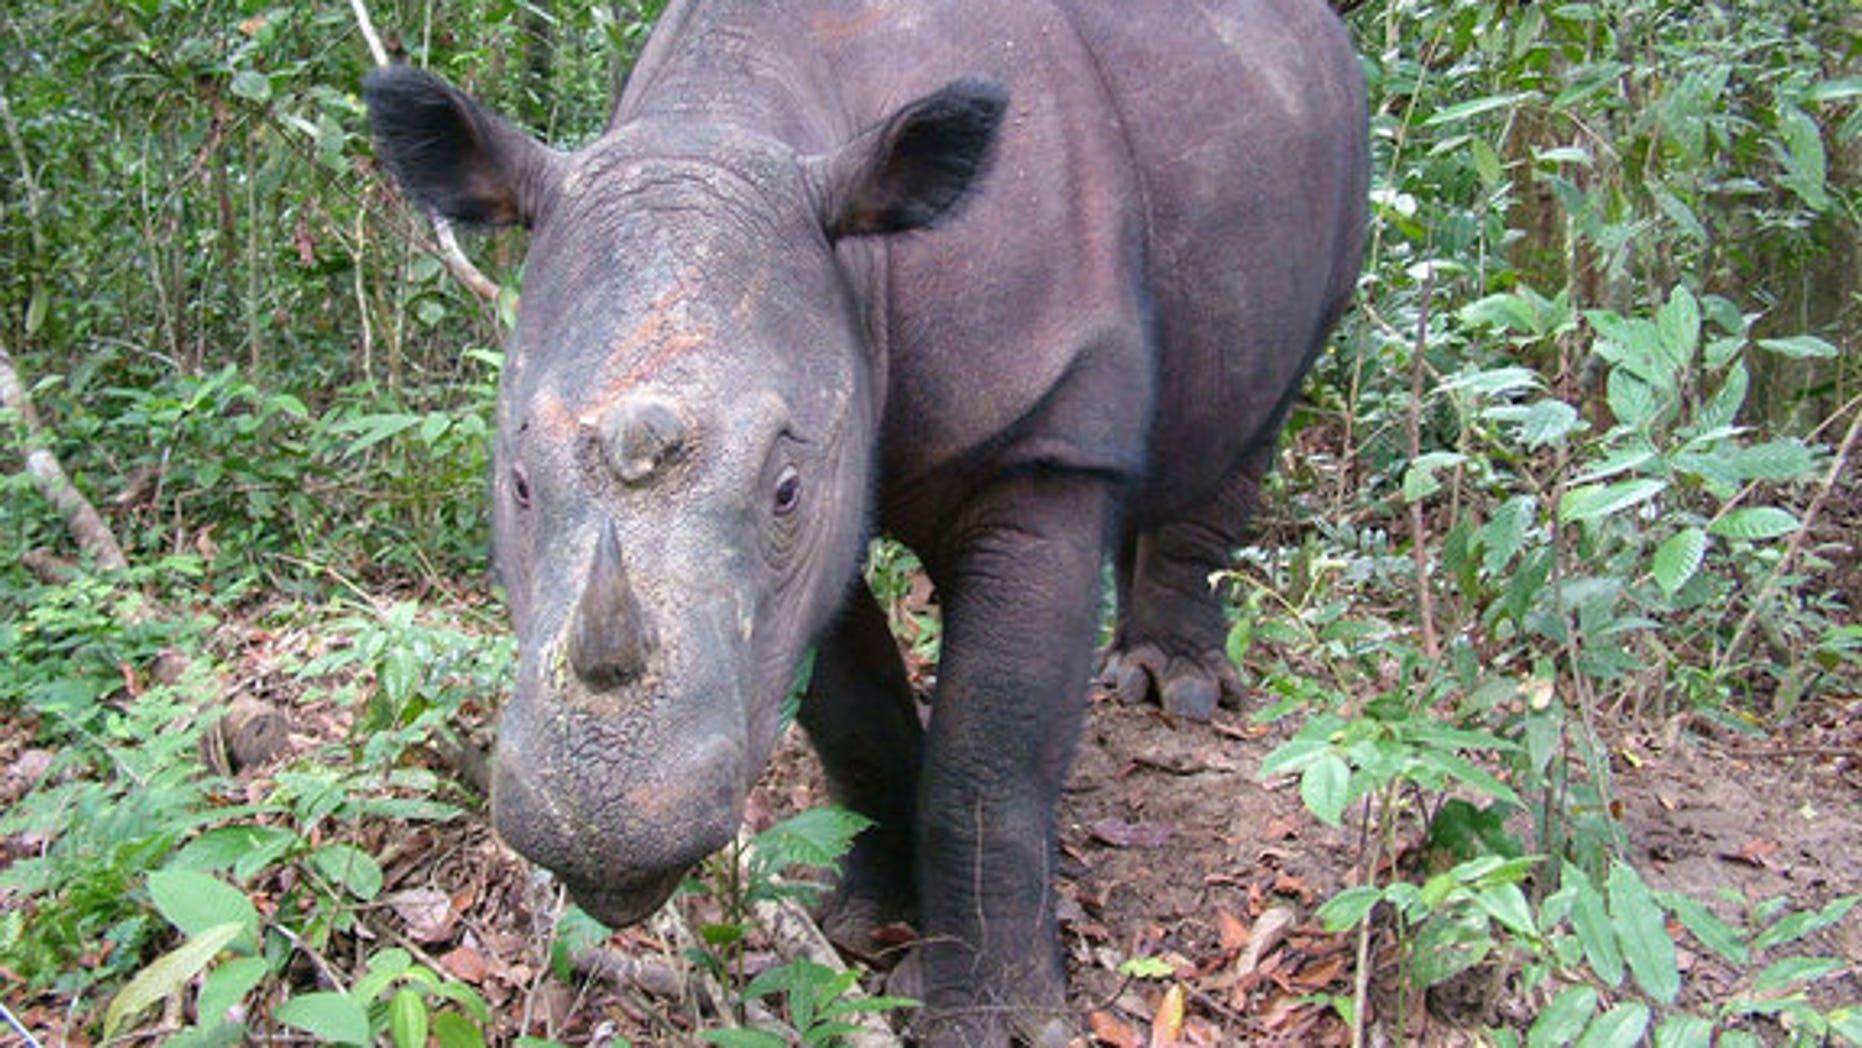 Fewer than 250 Sumatran rhinos (Dicerorhinus sumatrensis) are left in the wild.